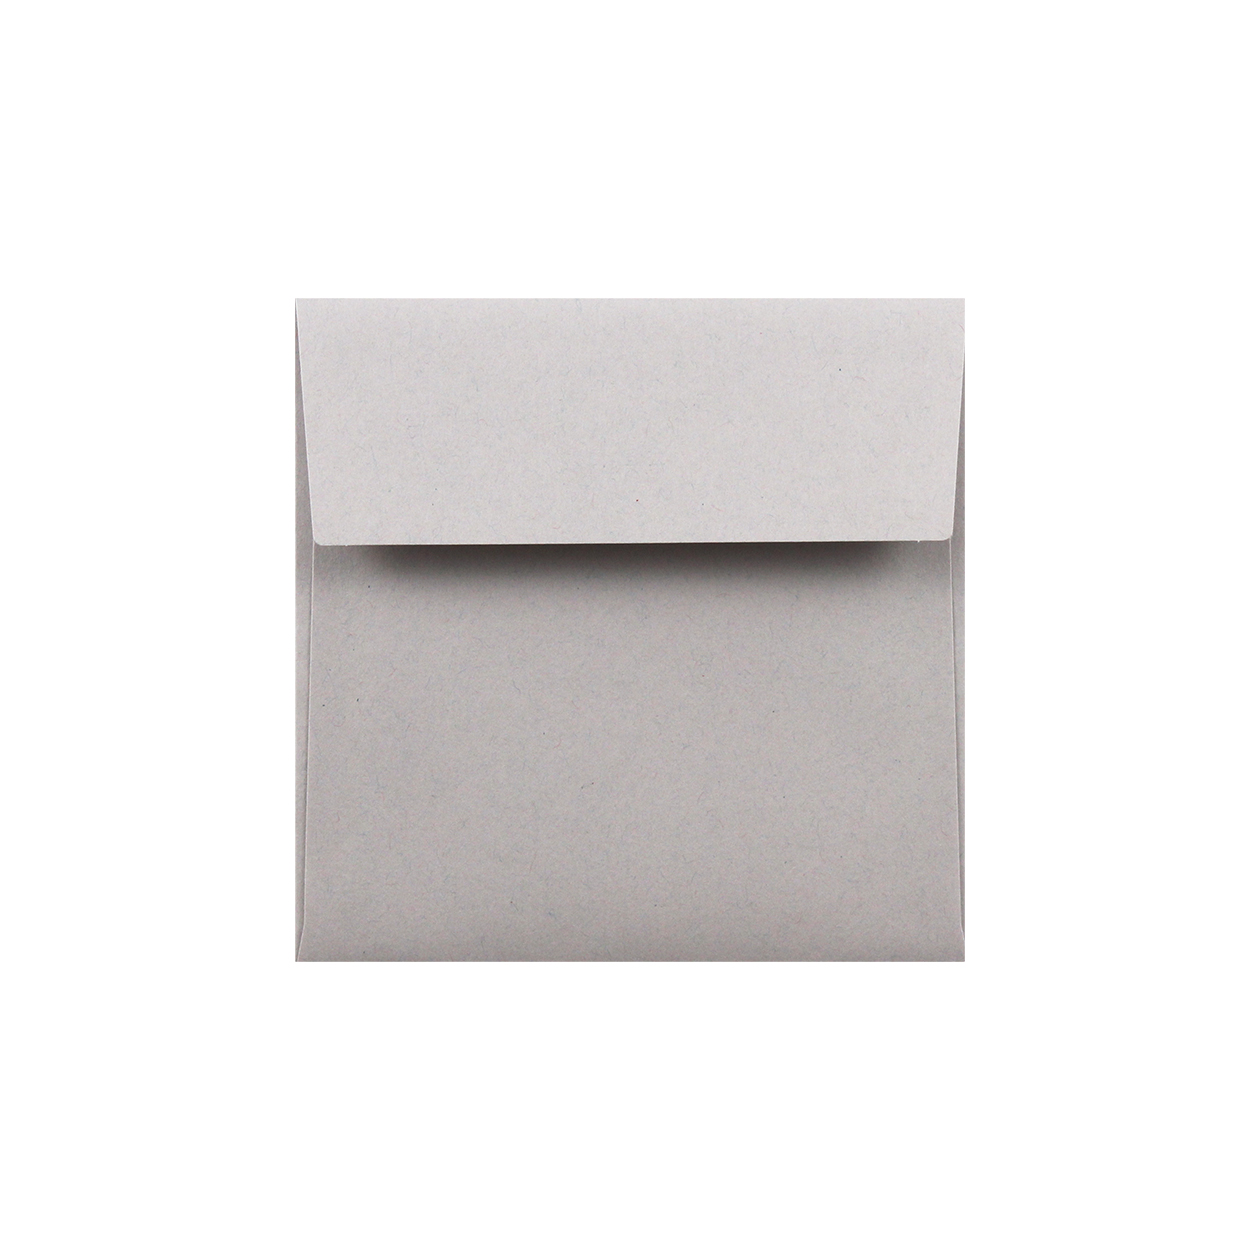 SE12.5カマス封筒 HAGURUMA Basic ライナーグレイ 100g